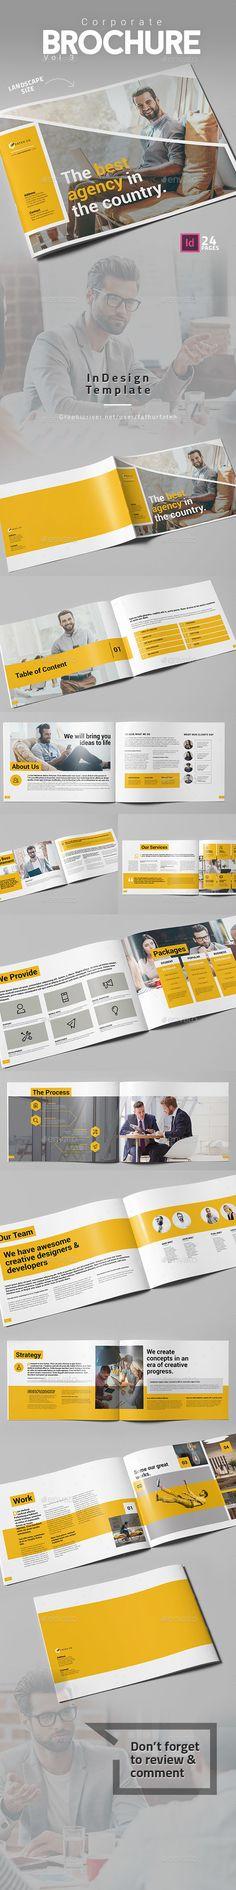 Corporate Brochure Vol.3 Landscape - #Corporate #Brochures Download here: https://graphicriver.net/item/corporate-brochure-vol3-landscape/19543766?ref=alena994